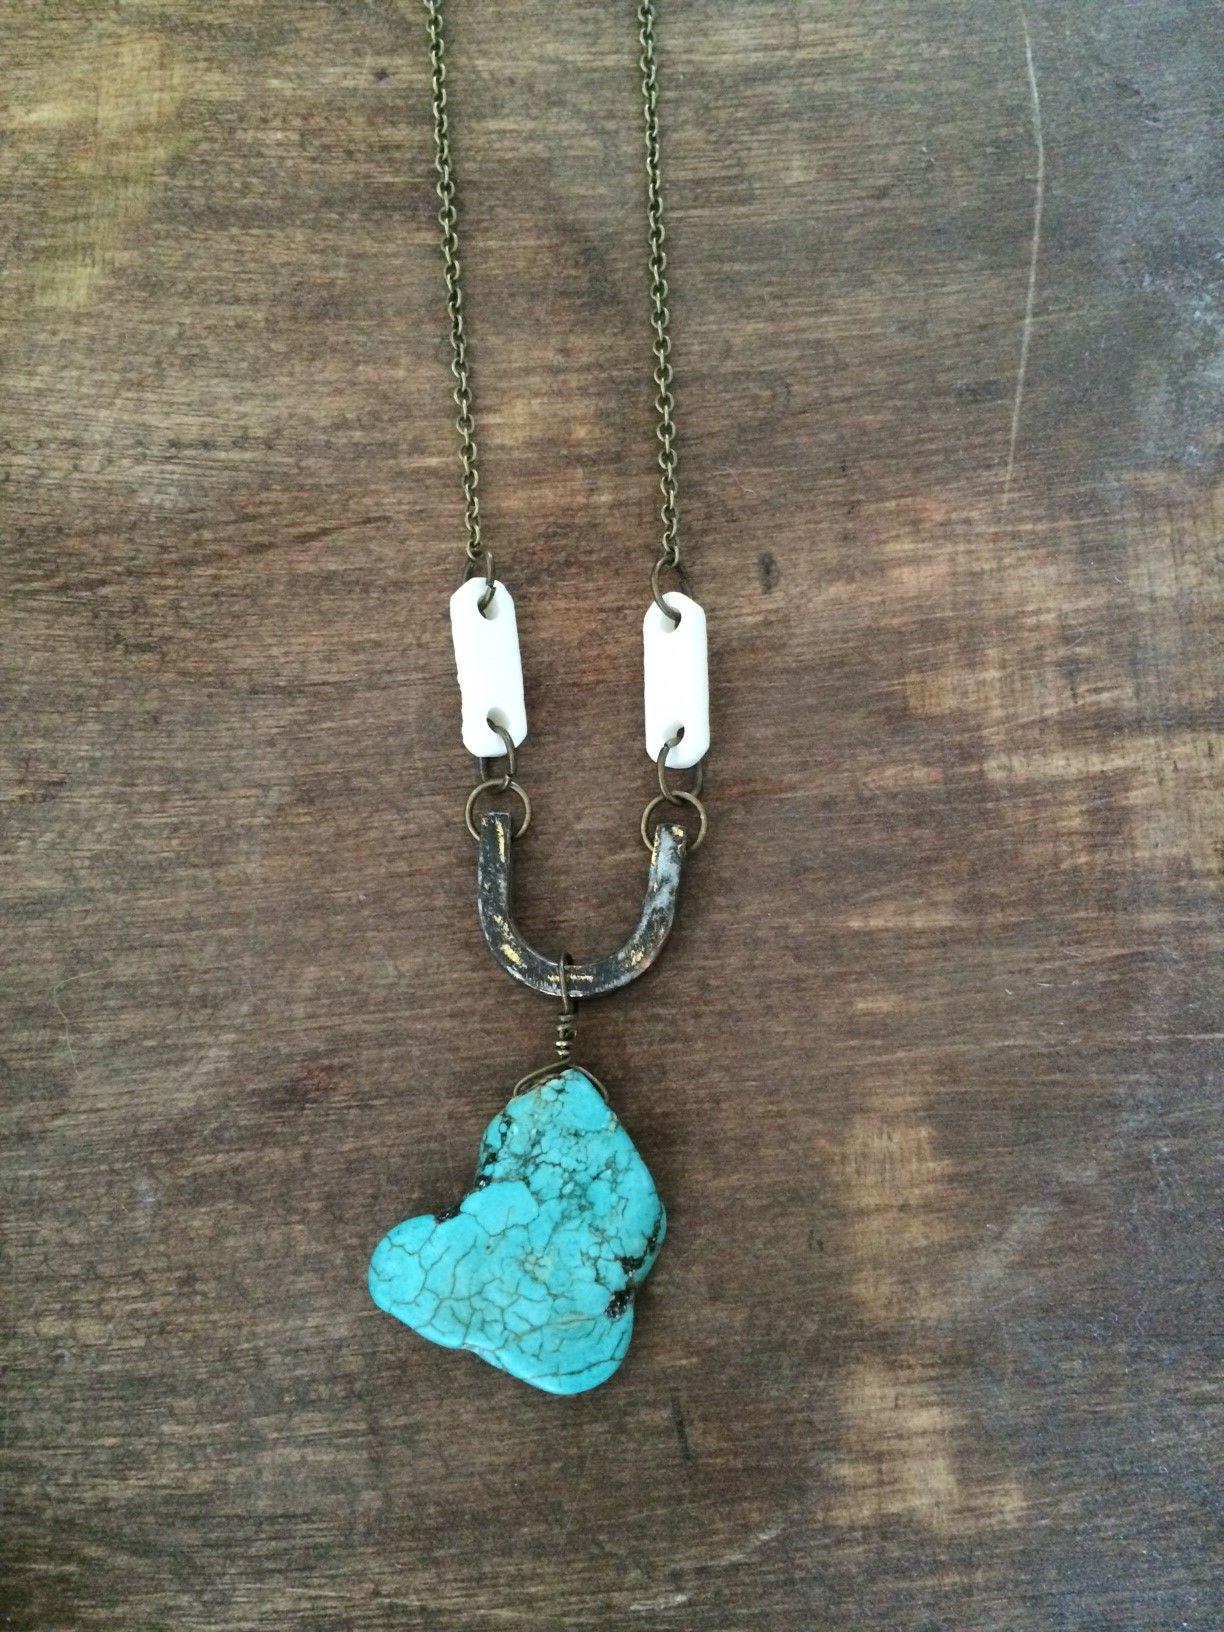 Menus turquoise stone pendant on antiqued u with bone connectors on